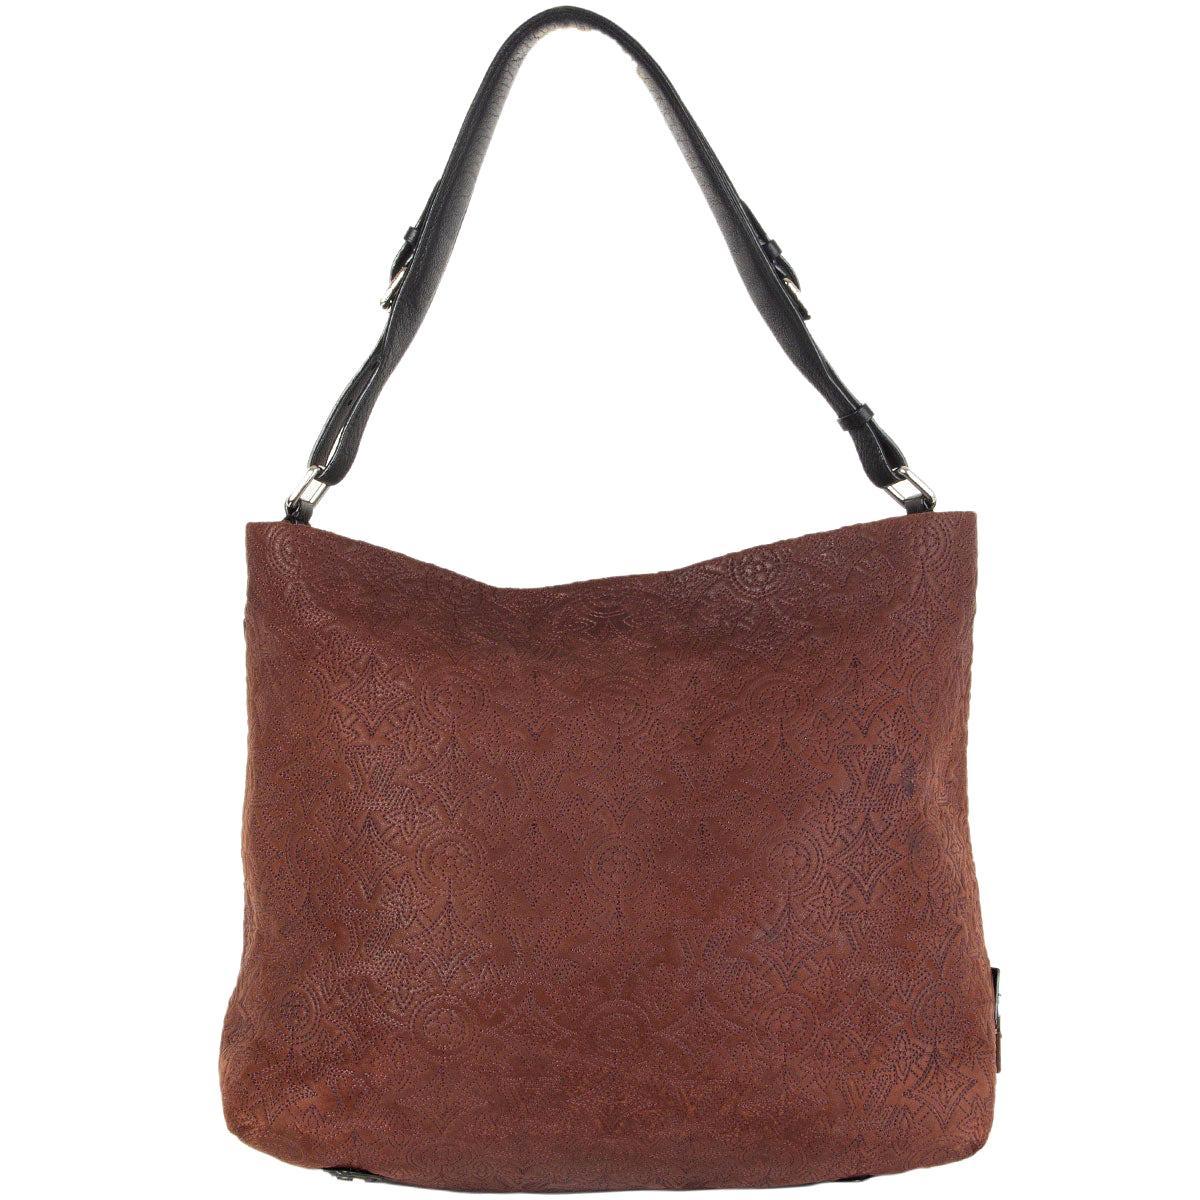 LOUIS VUITTON Chocolate brown leather MONOGRAM ANTHEIA PM HOBO Shoulder Bag